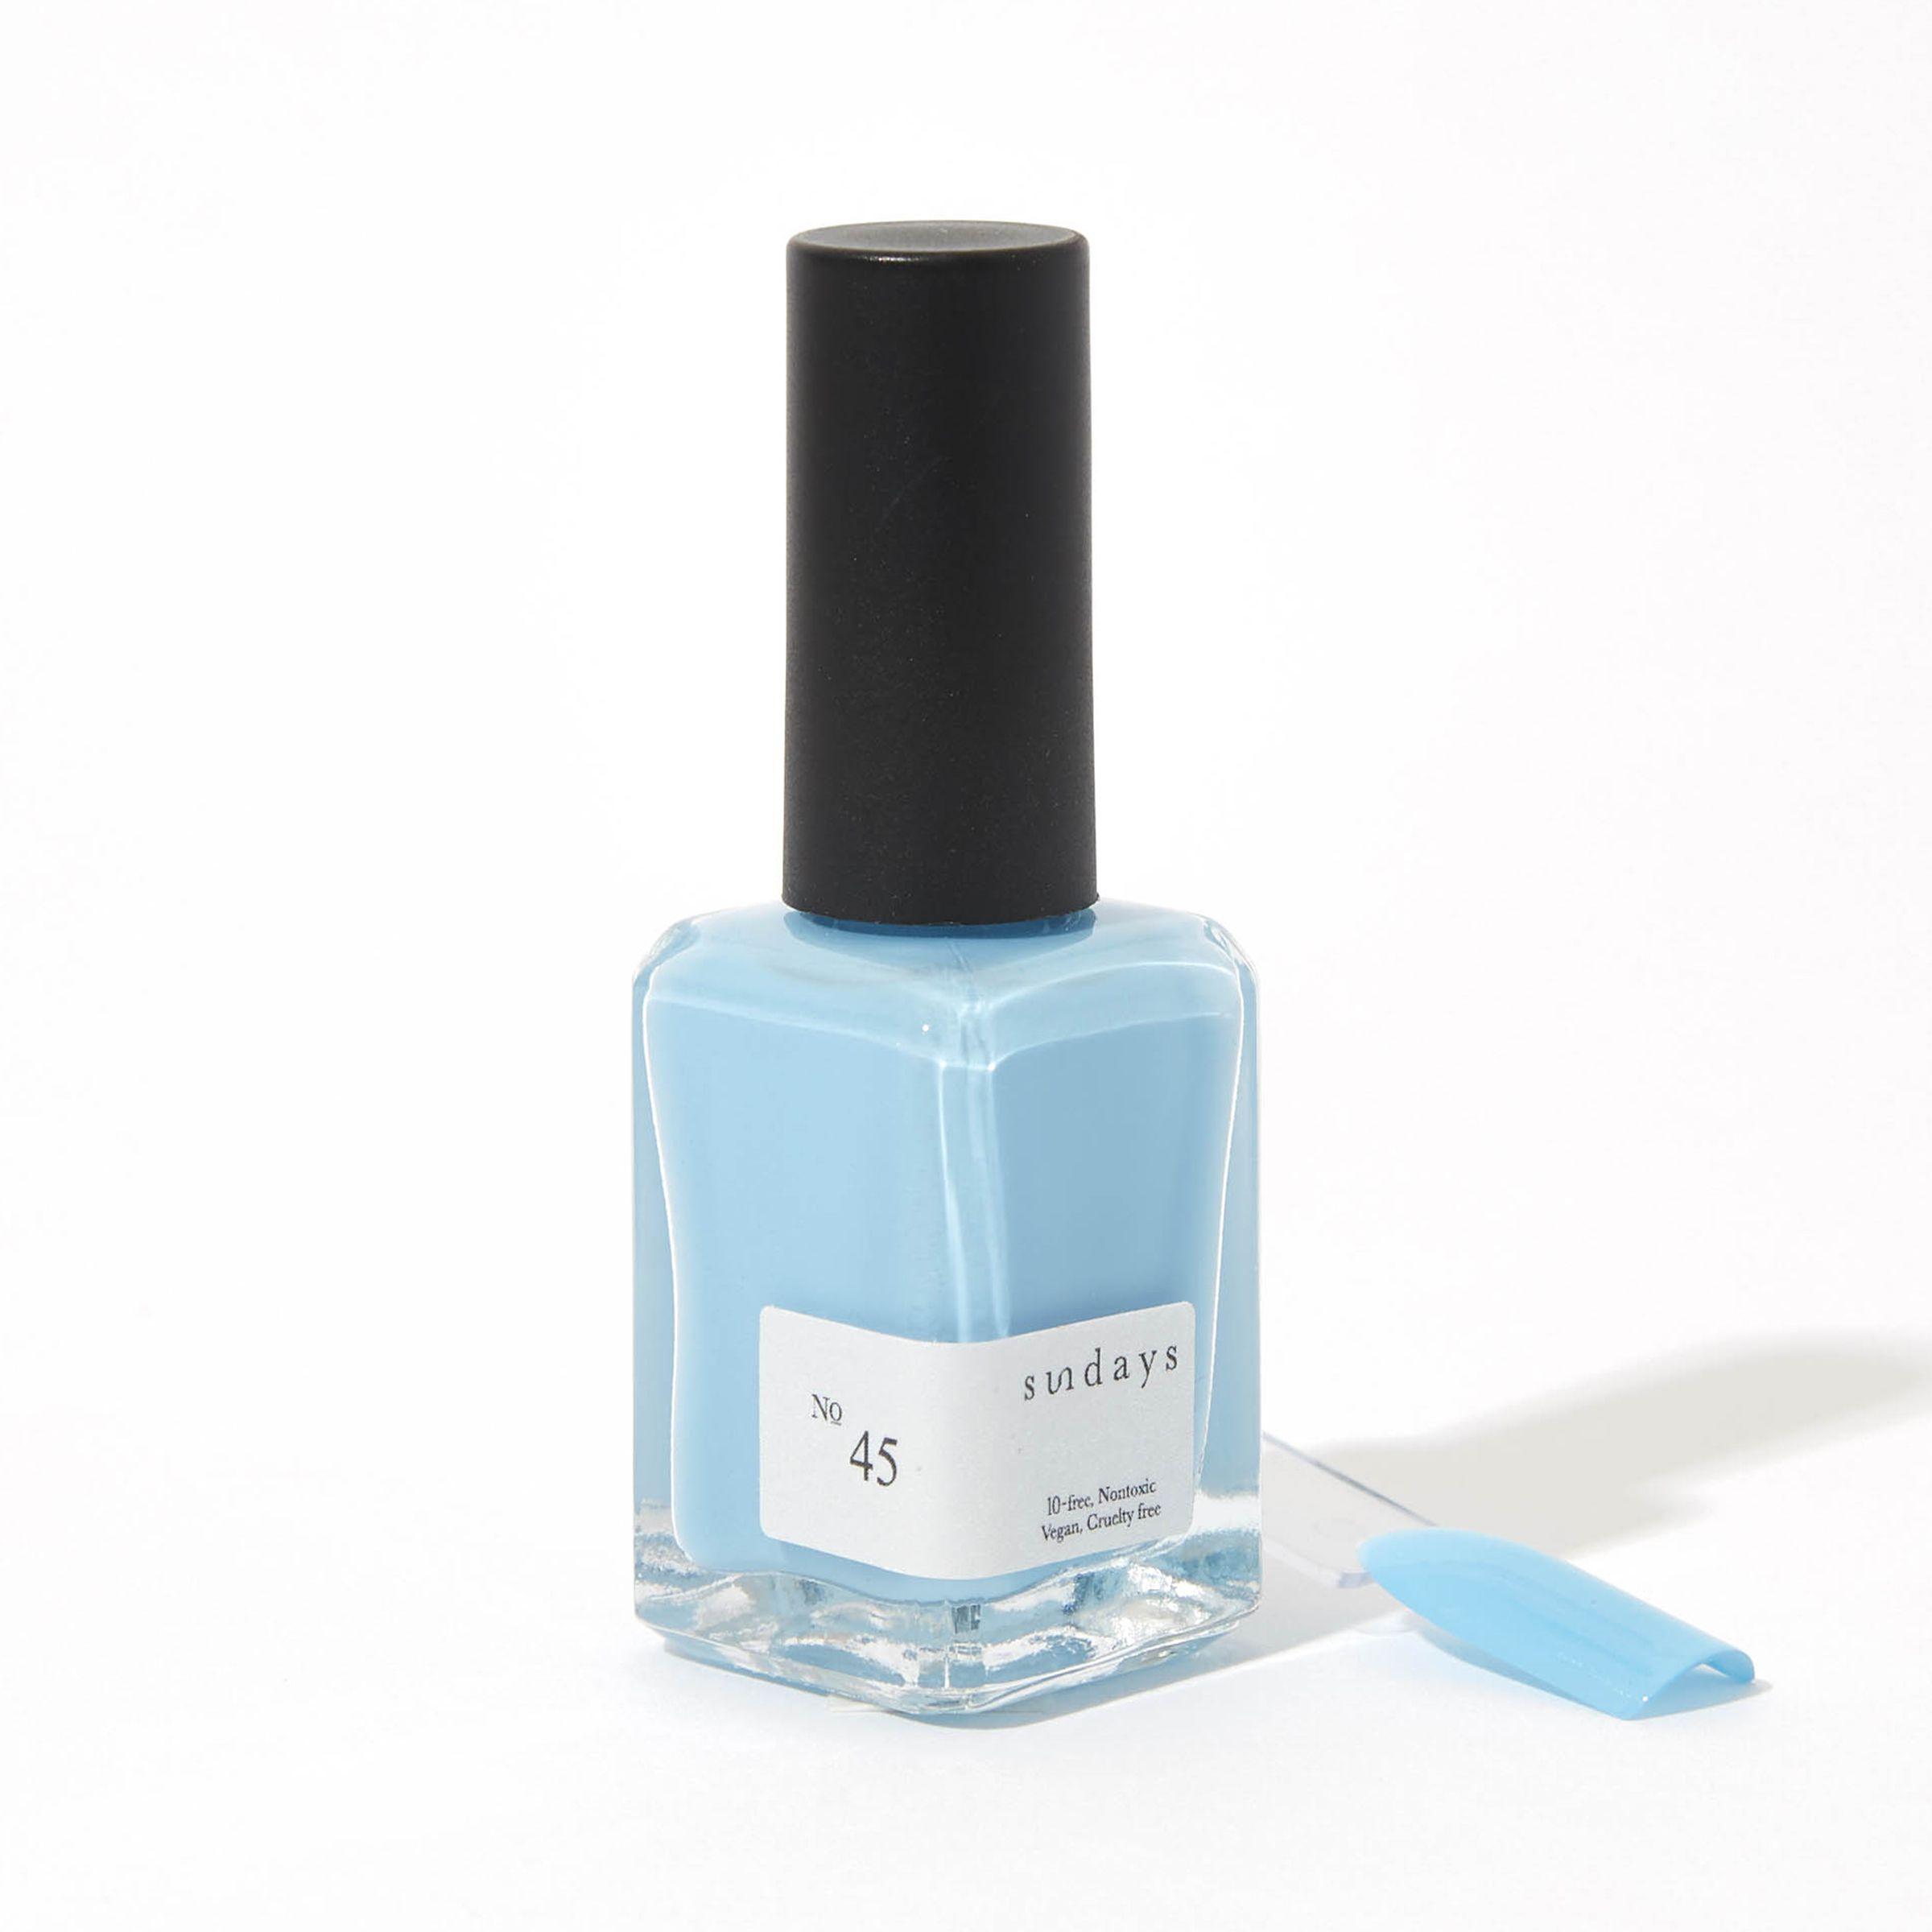 sky blue nail polish bottle